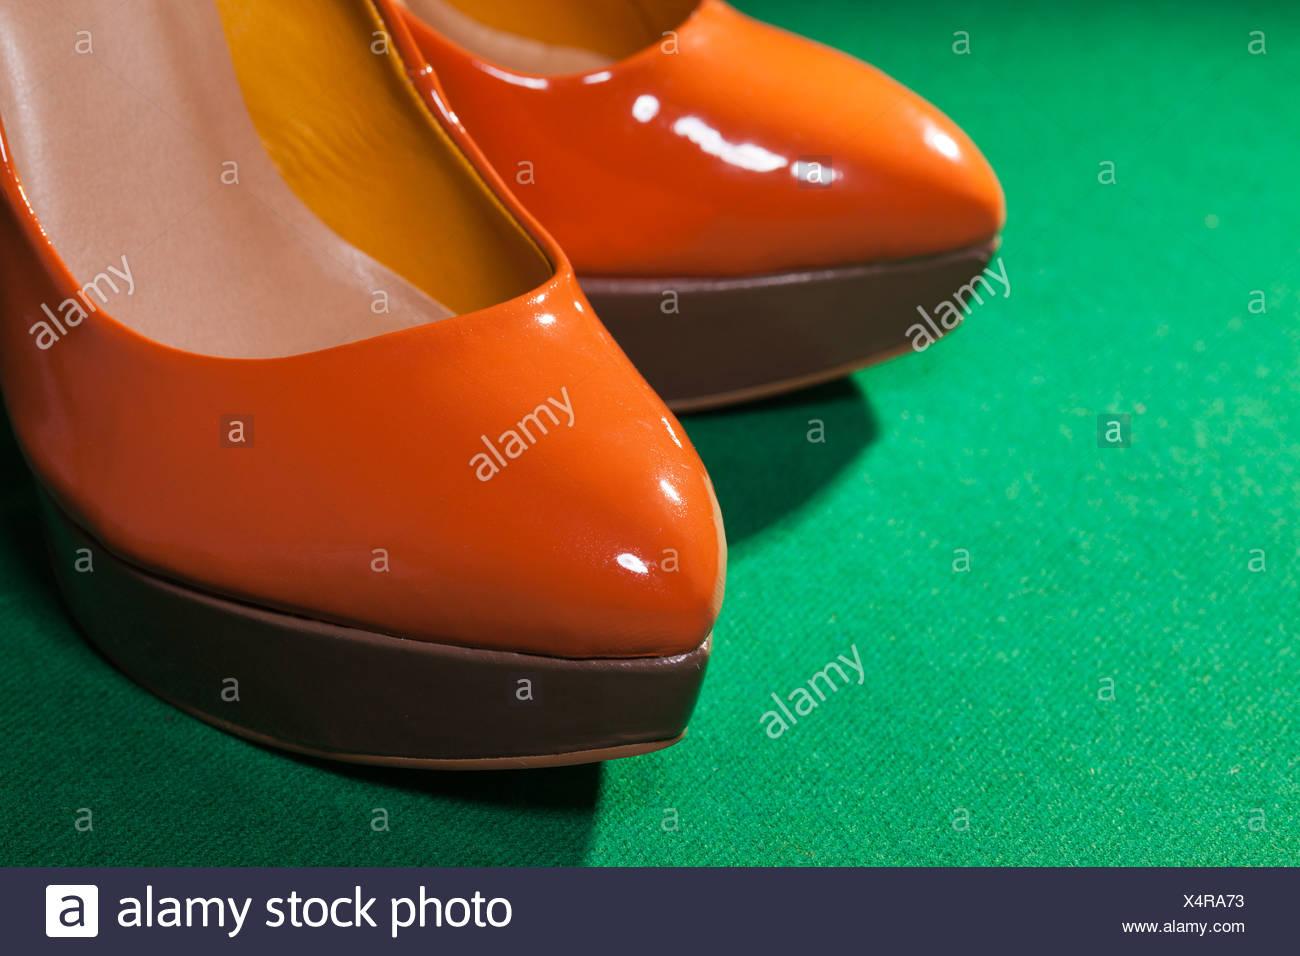 Orange Shoe Stockfotos & Orange Shoe Bilder - Alamy